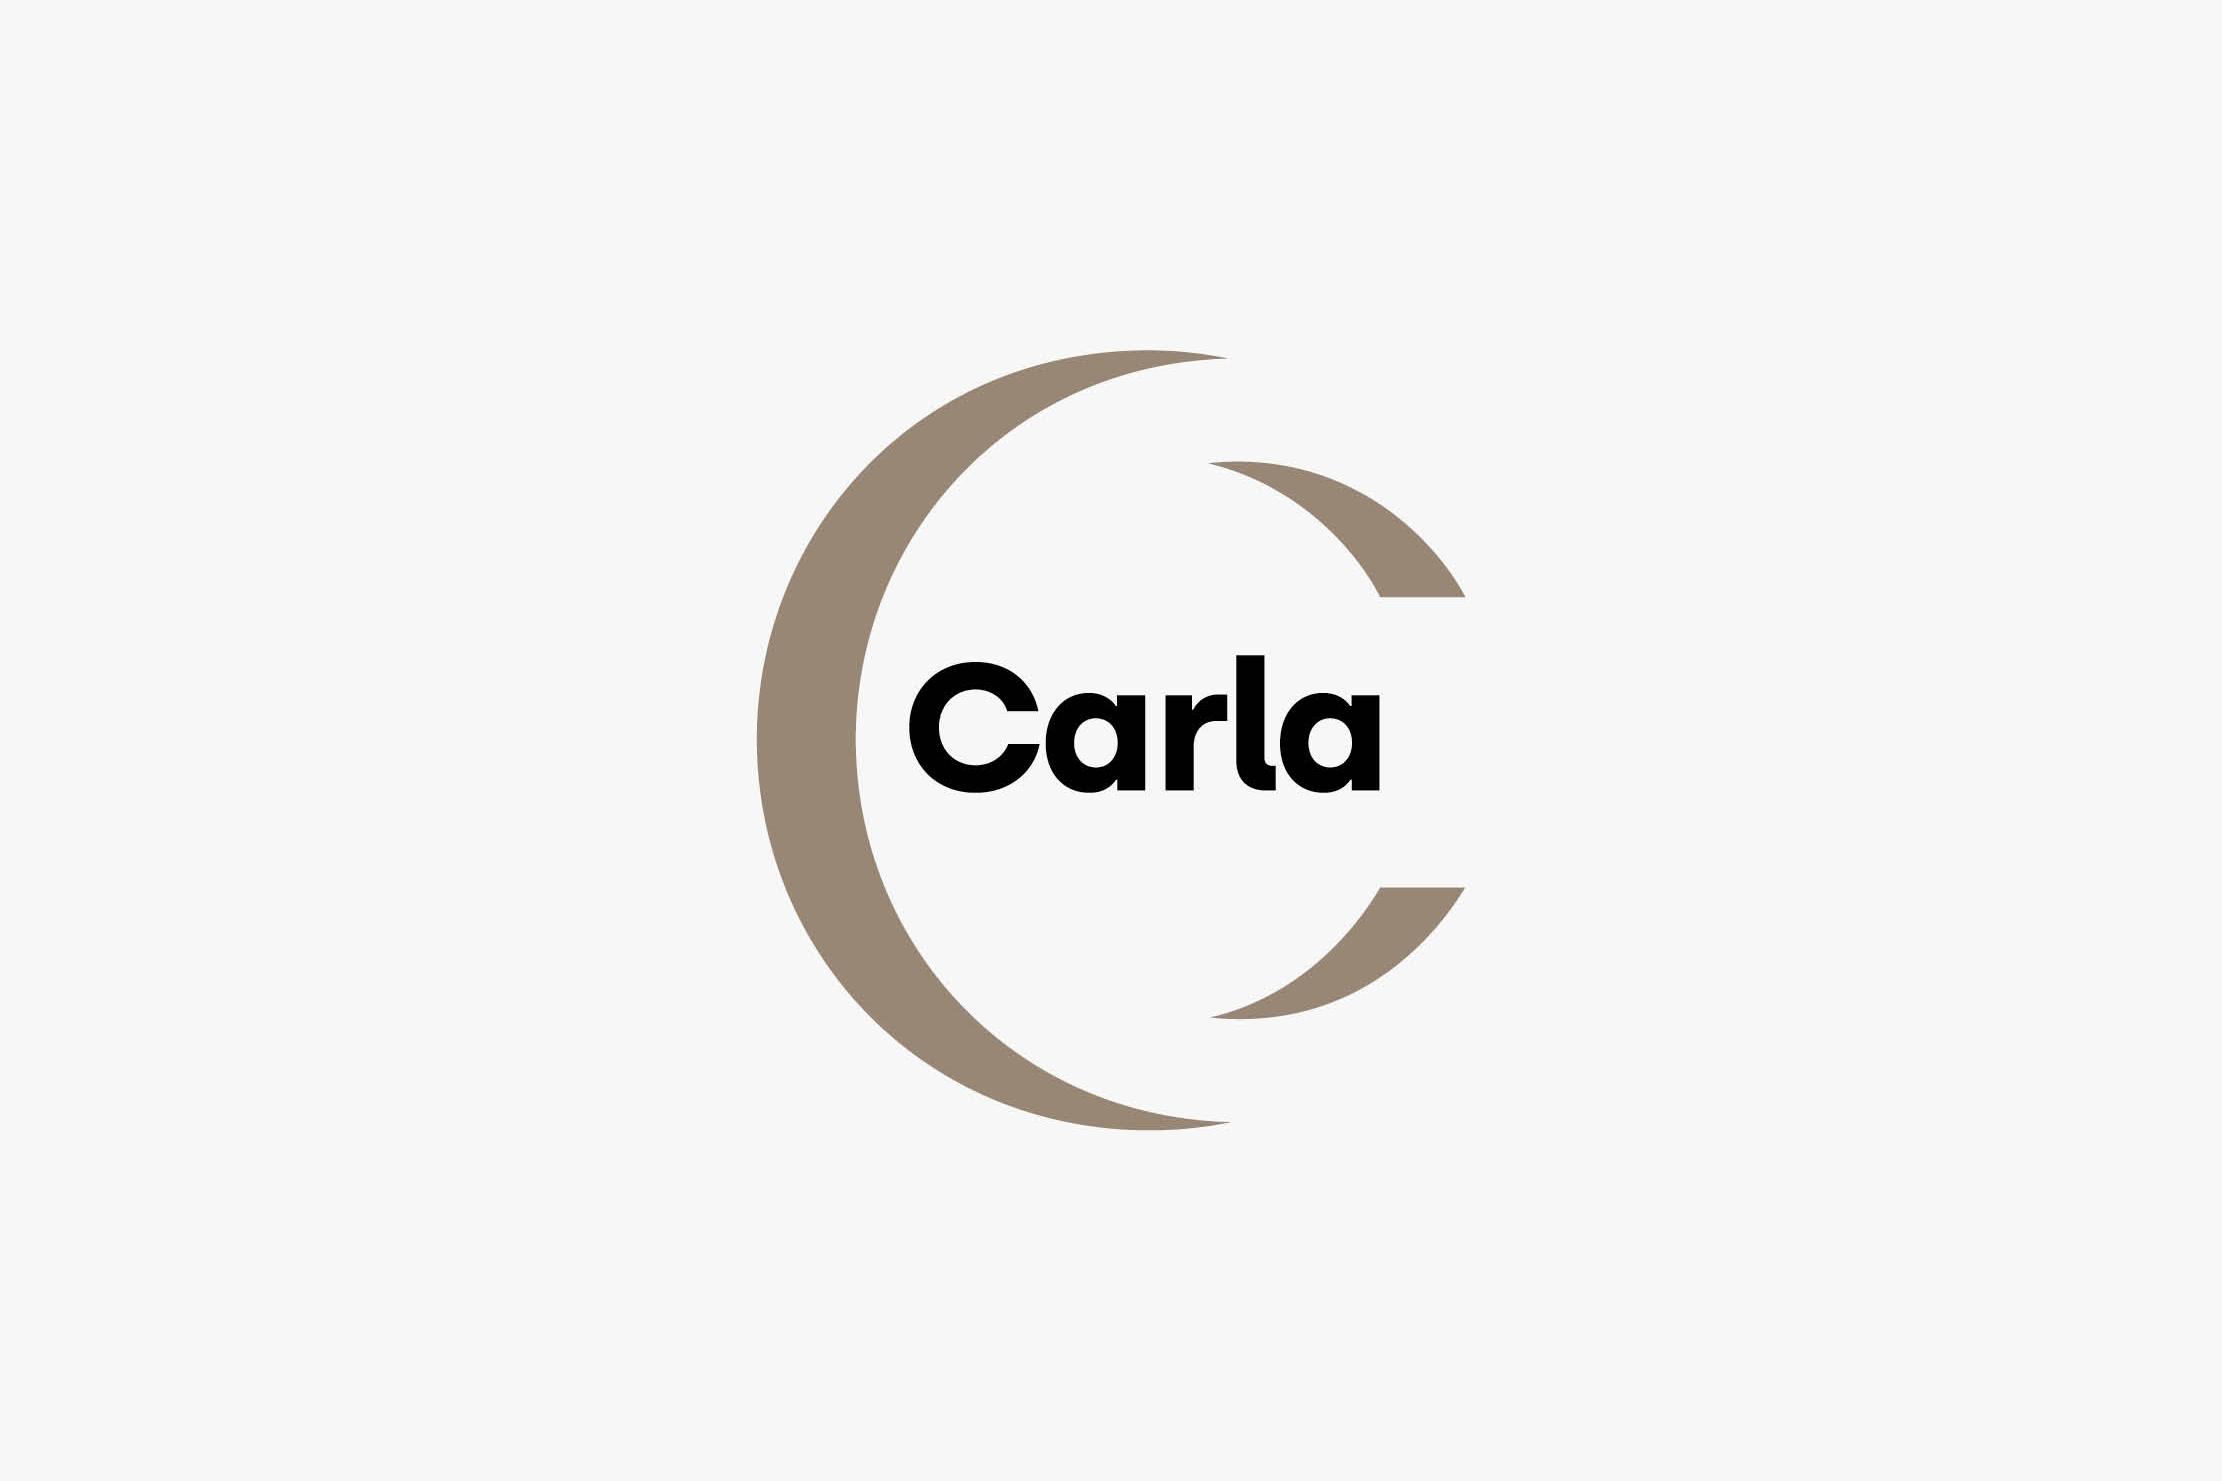 Carla-logo-Daniel-Cavalcanti-1